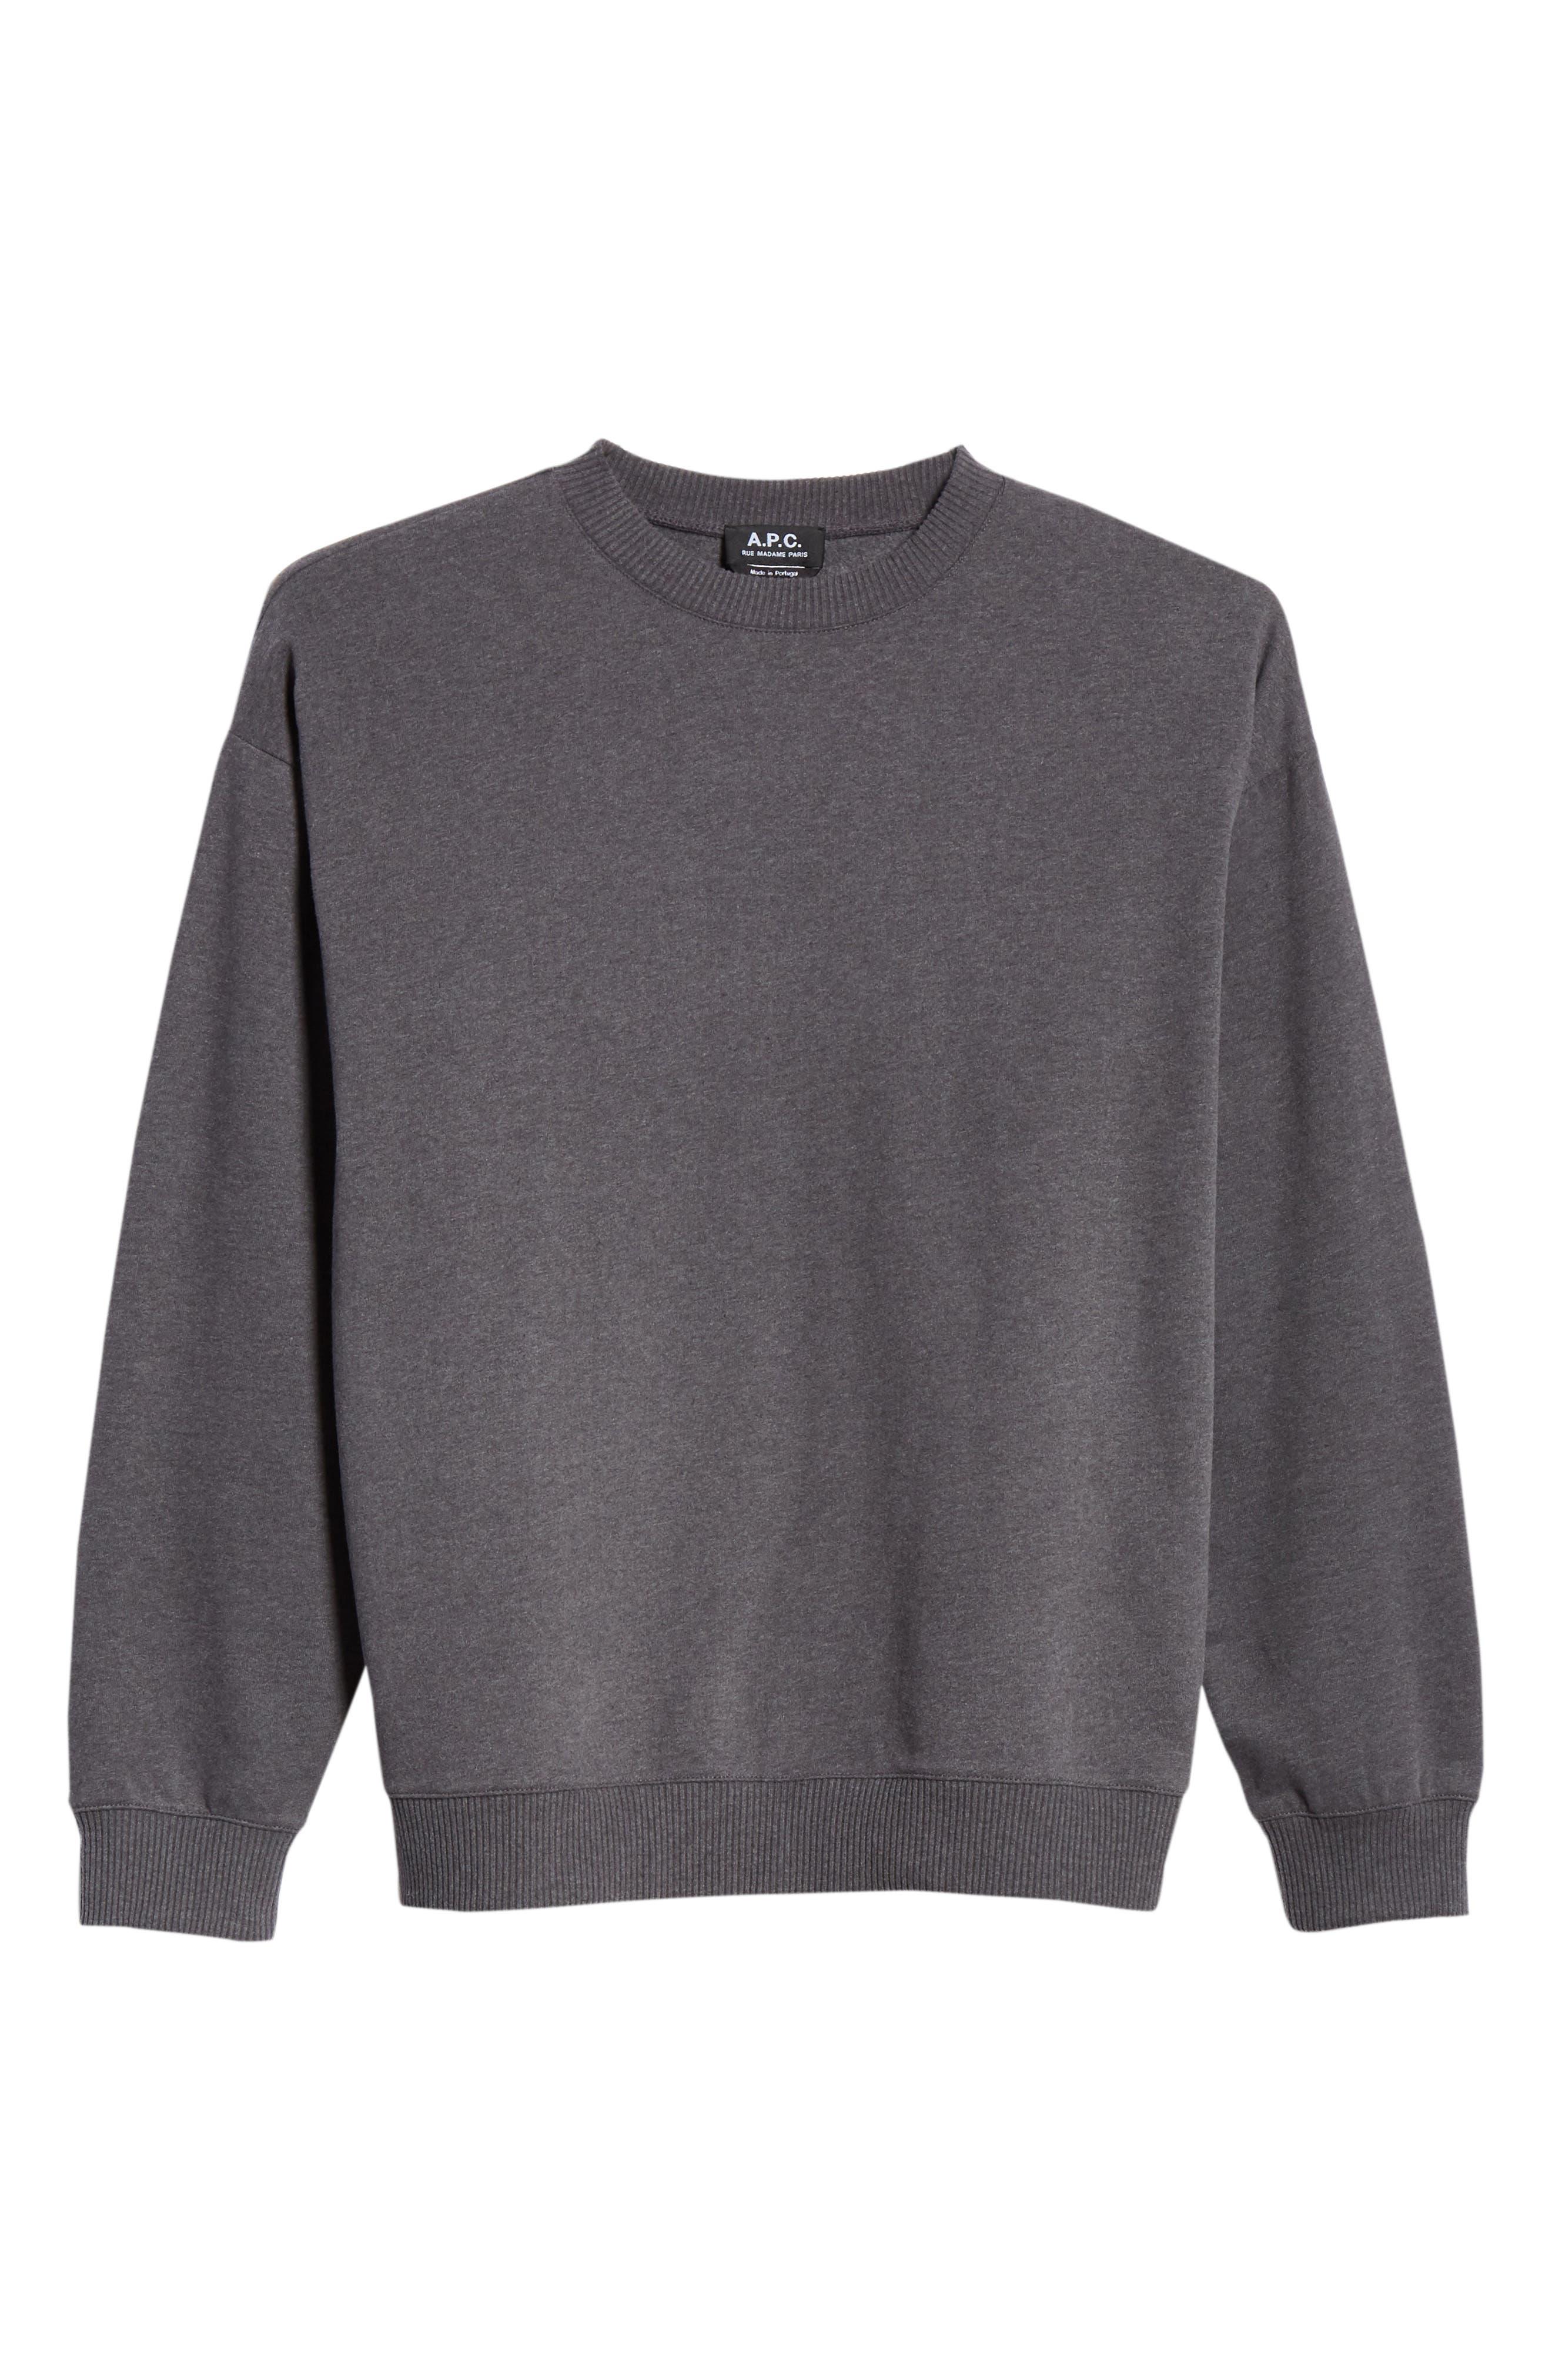 Roman Crewneck Sweatshirt,                             Alternate thumbnail 6, color,                             ANTHRACITE LAD